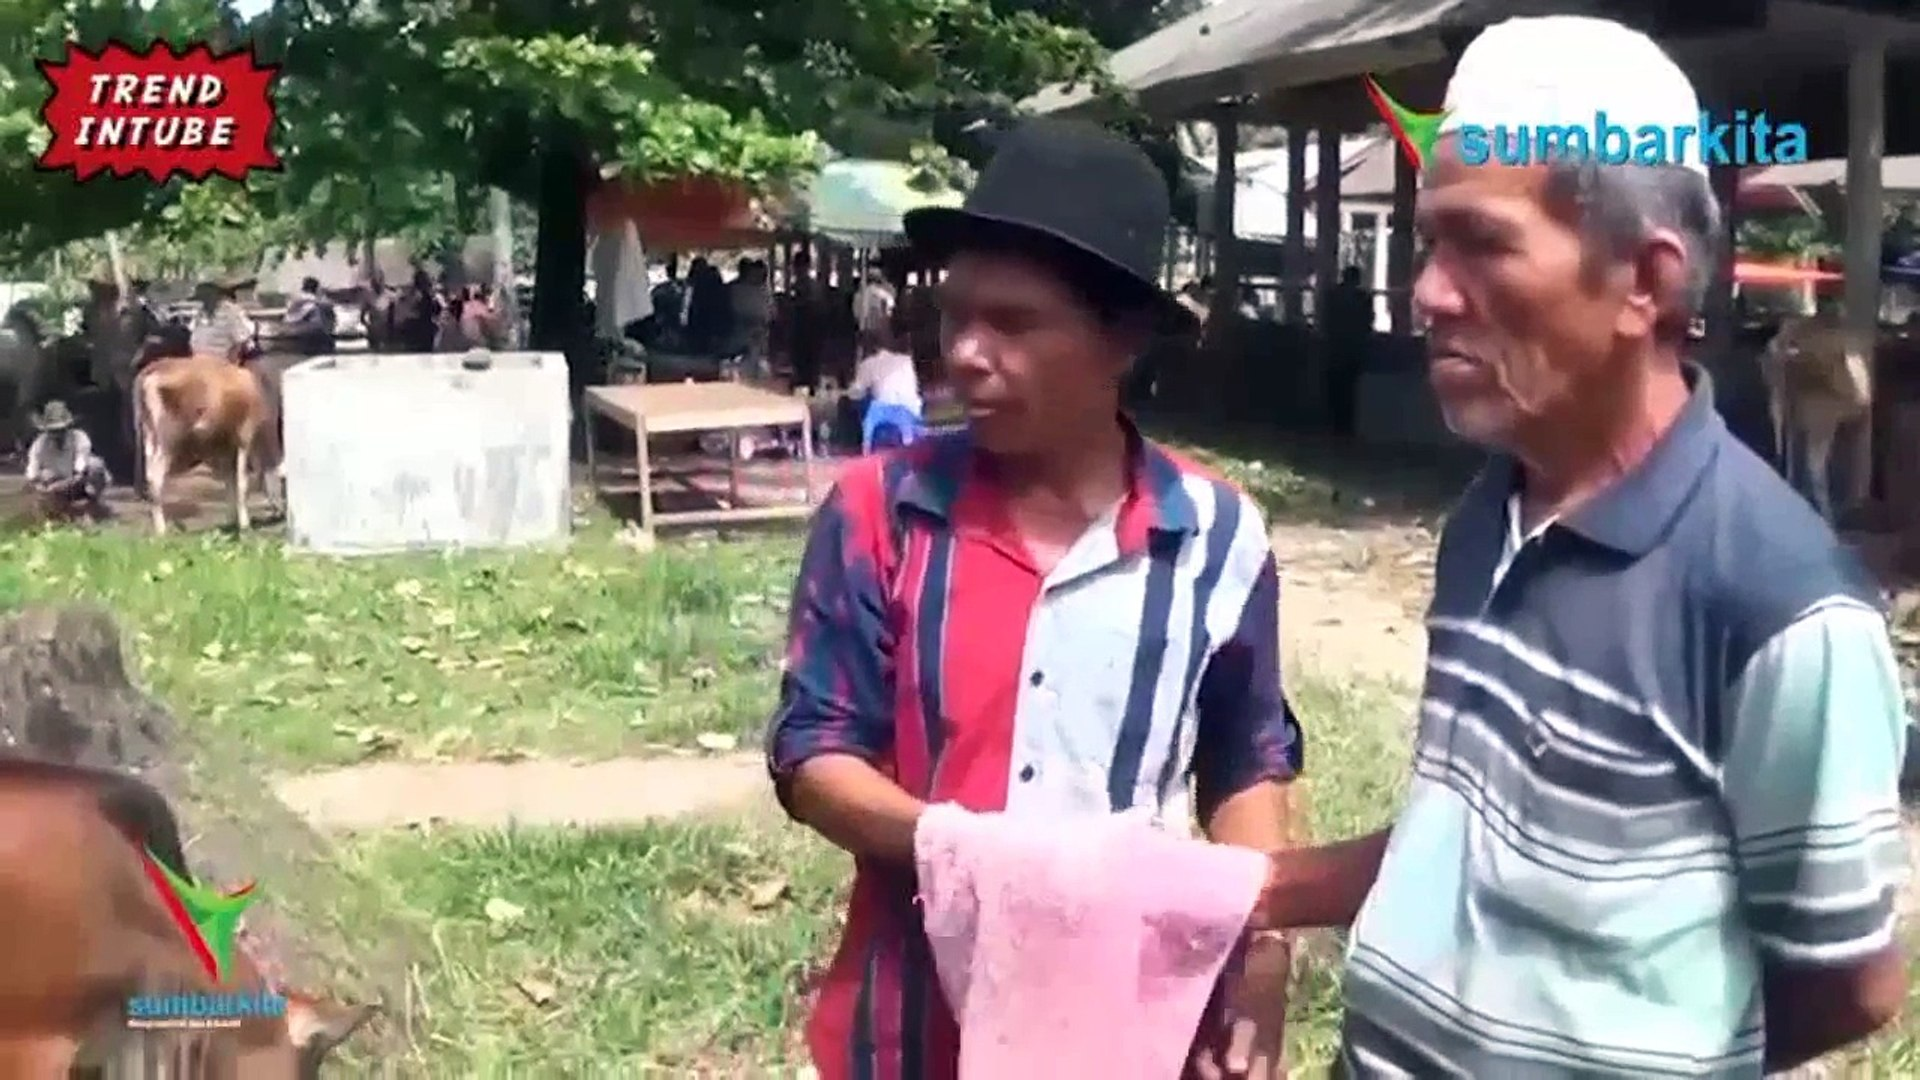 JOMBLO WAJIB NONTON , 10 PASAR UNIK 'BISA BELI ISTRI' Wow